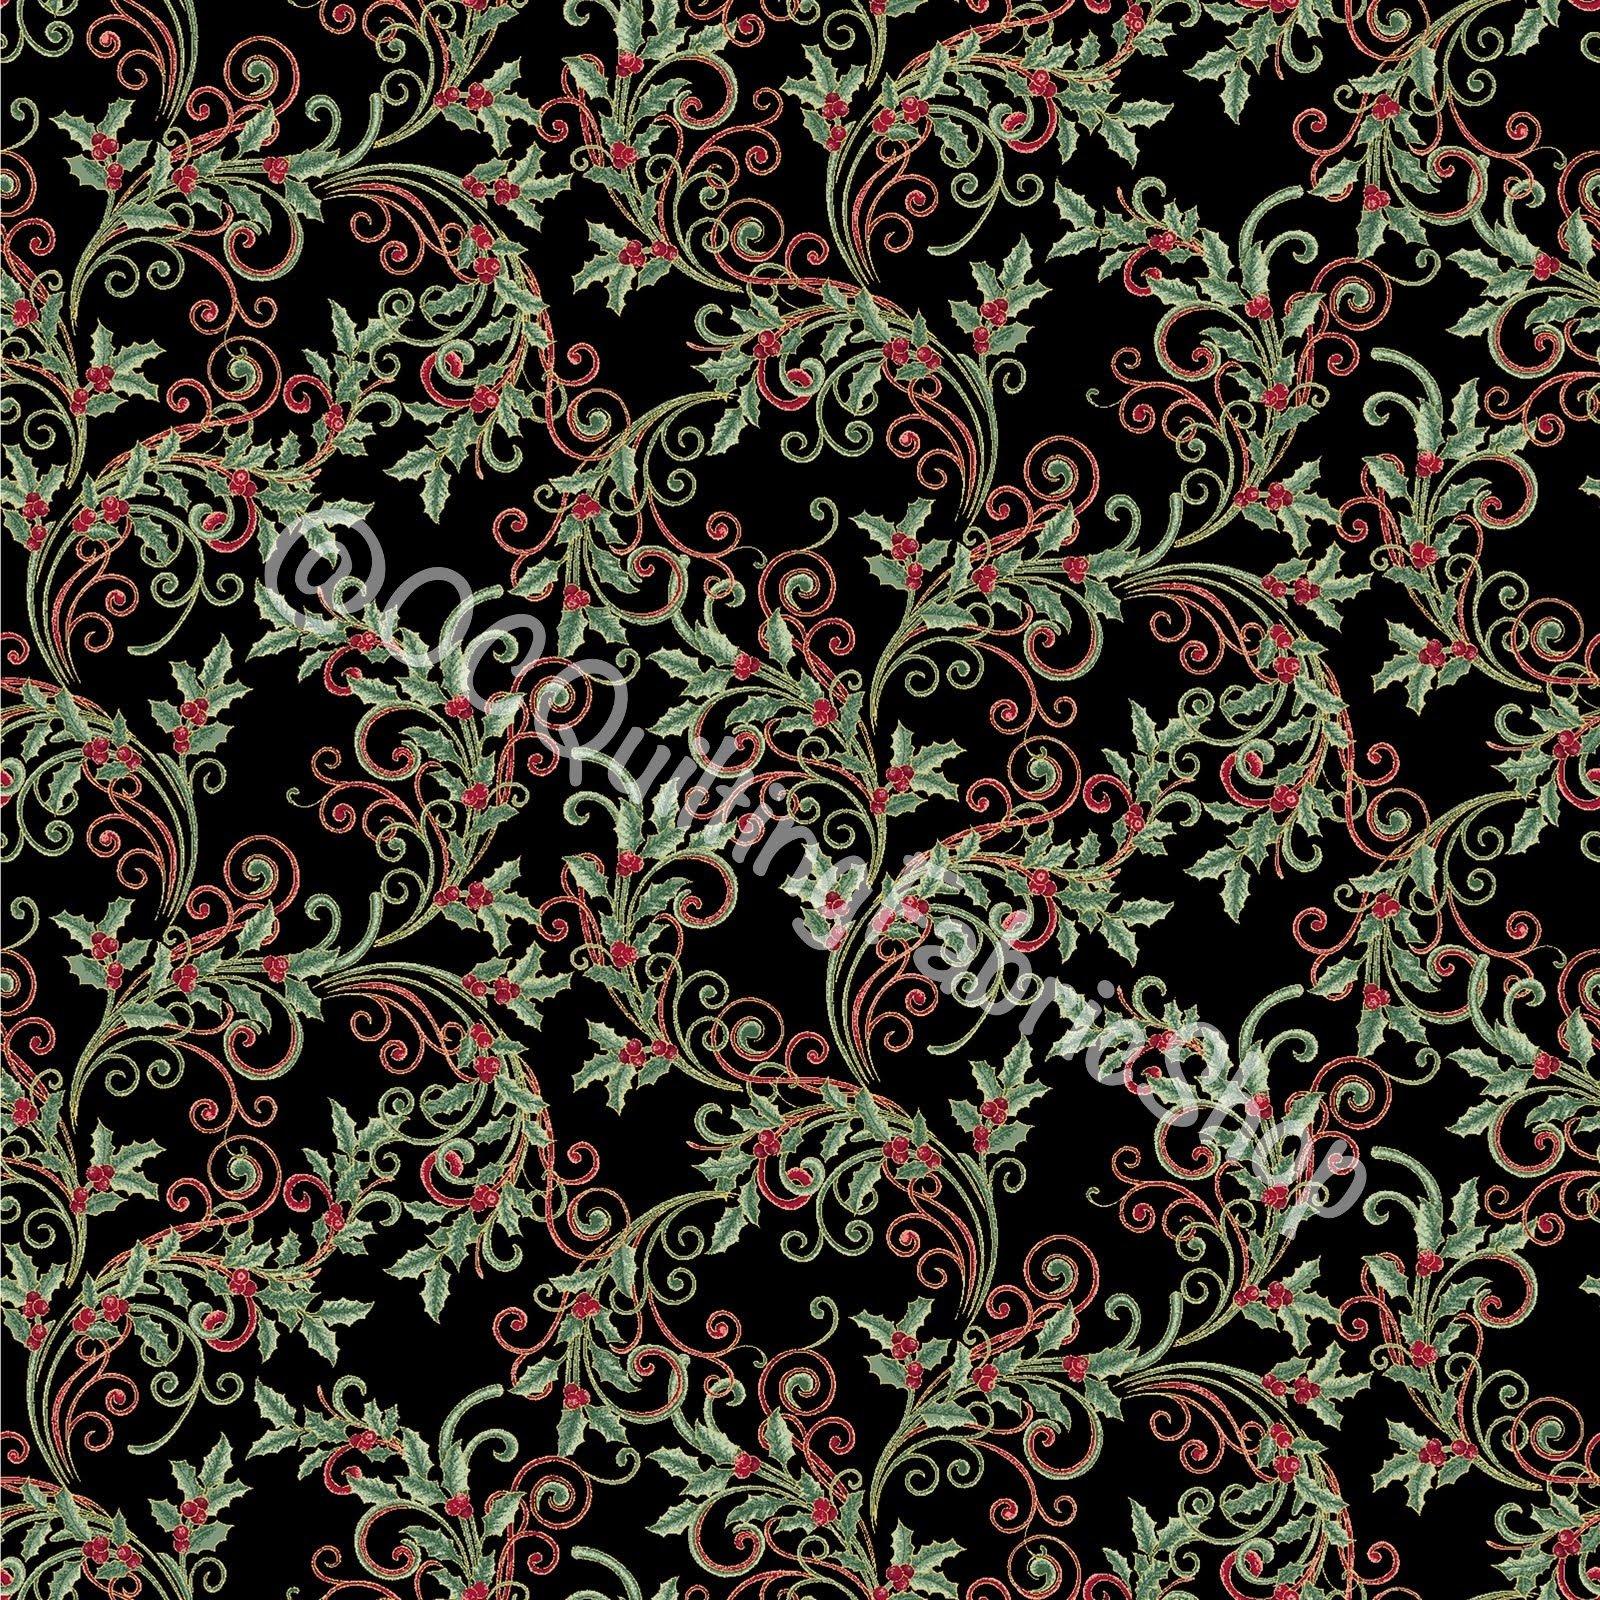 Benartex Winter Elegance Holly Scroll Black Metallic